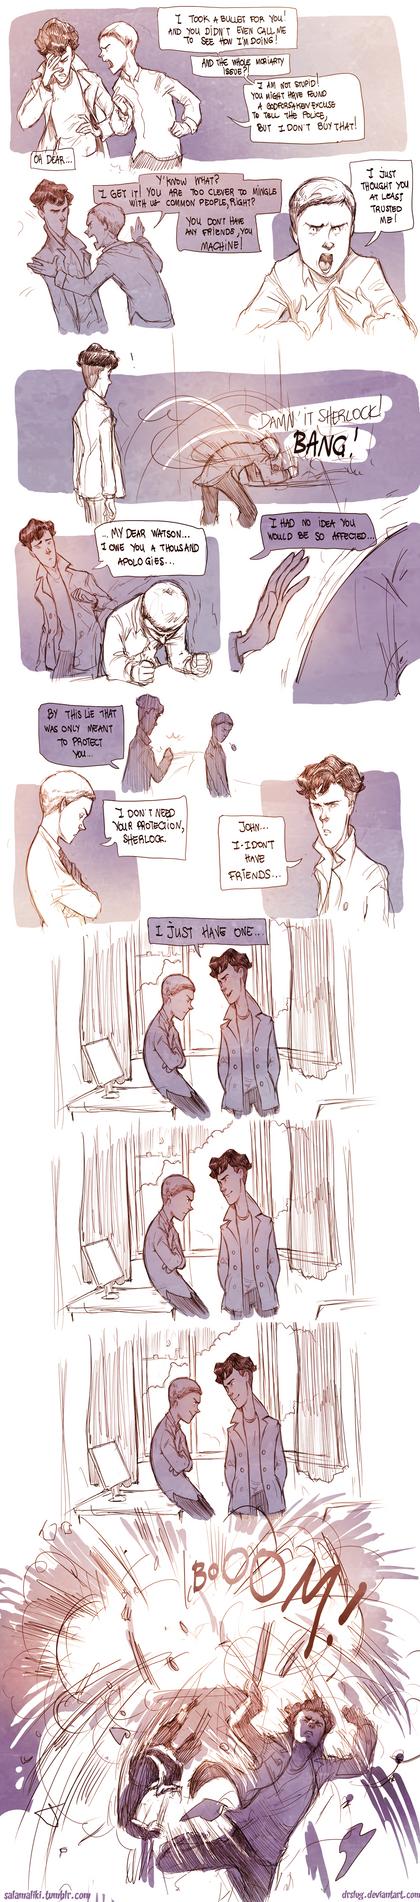 Teen Sherlock - Irene Pt4 by DrSlug